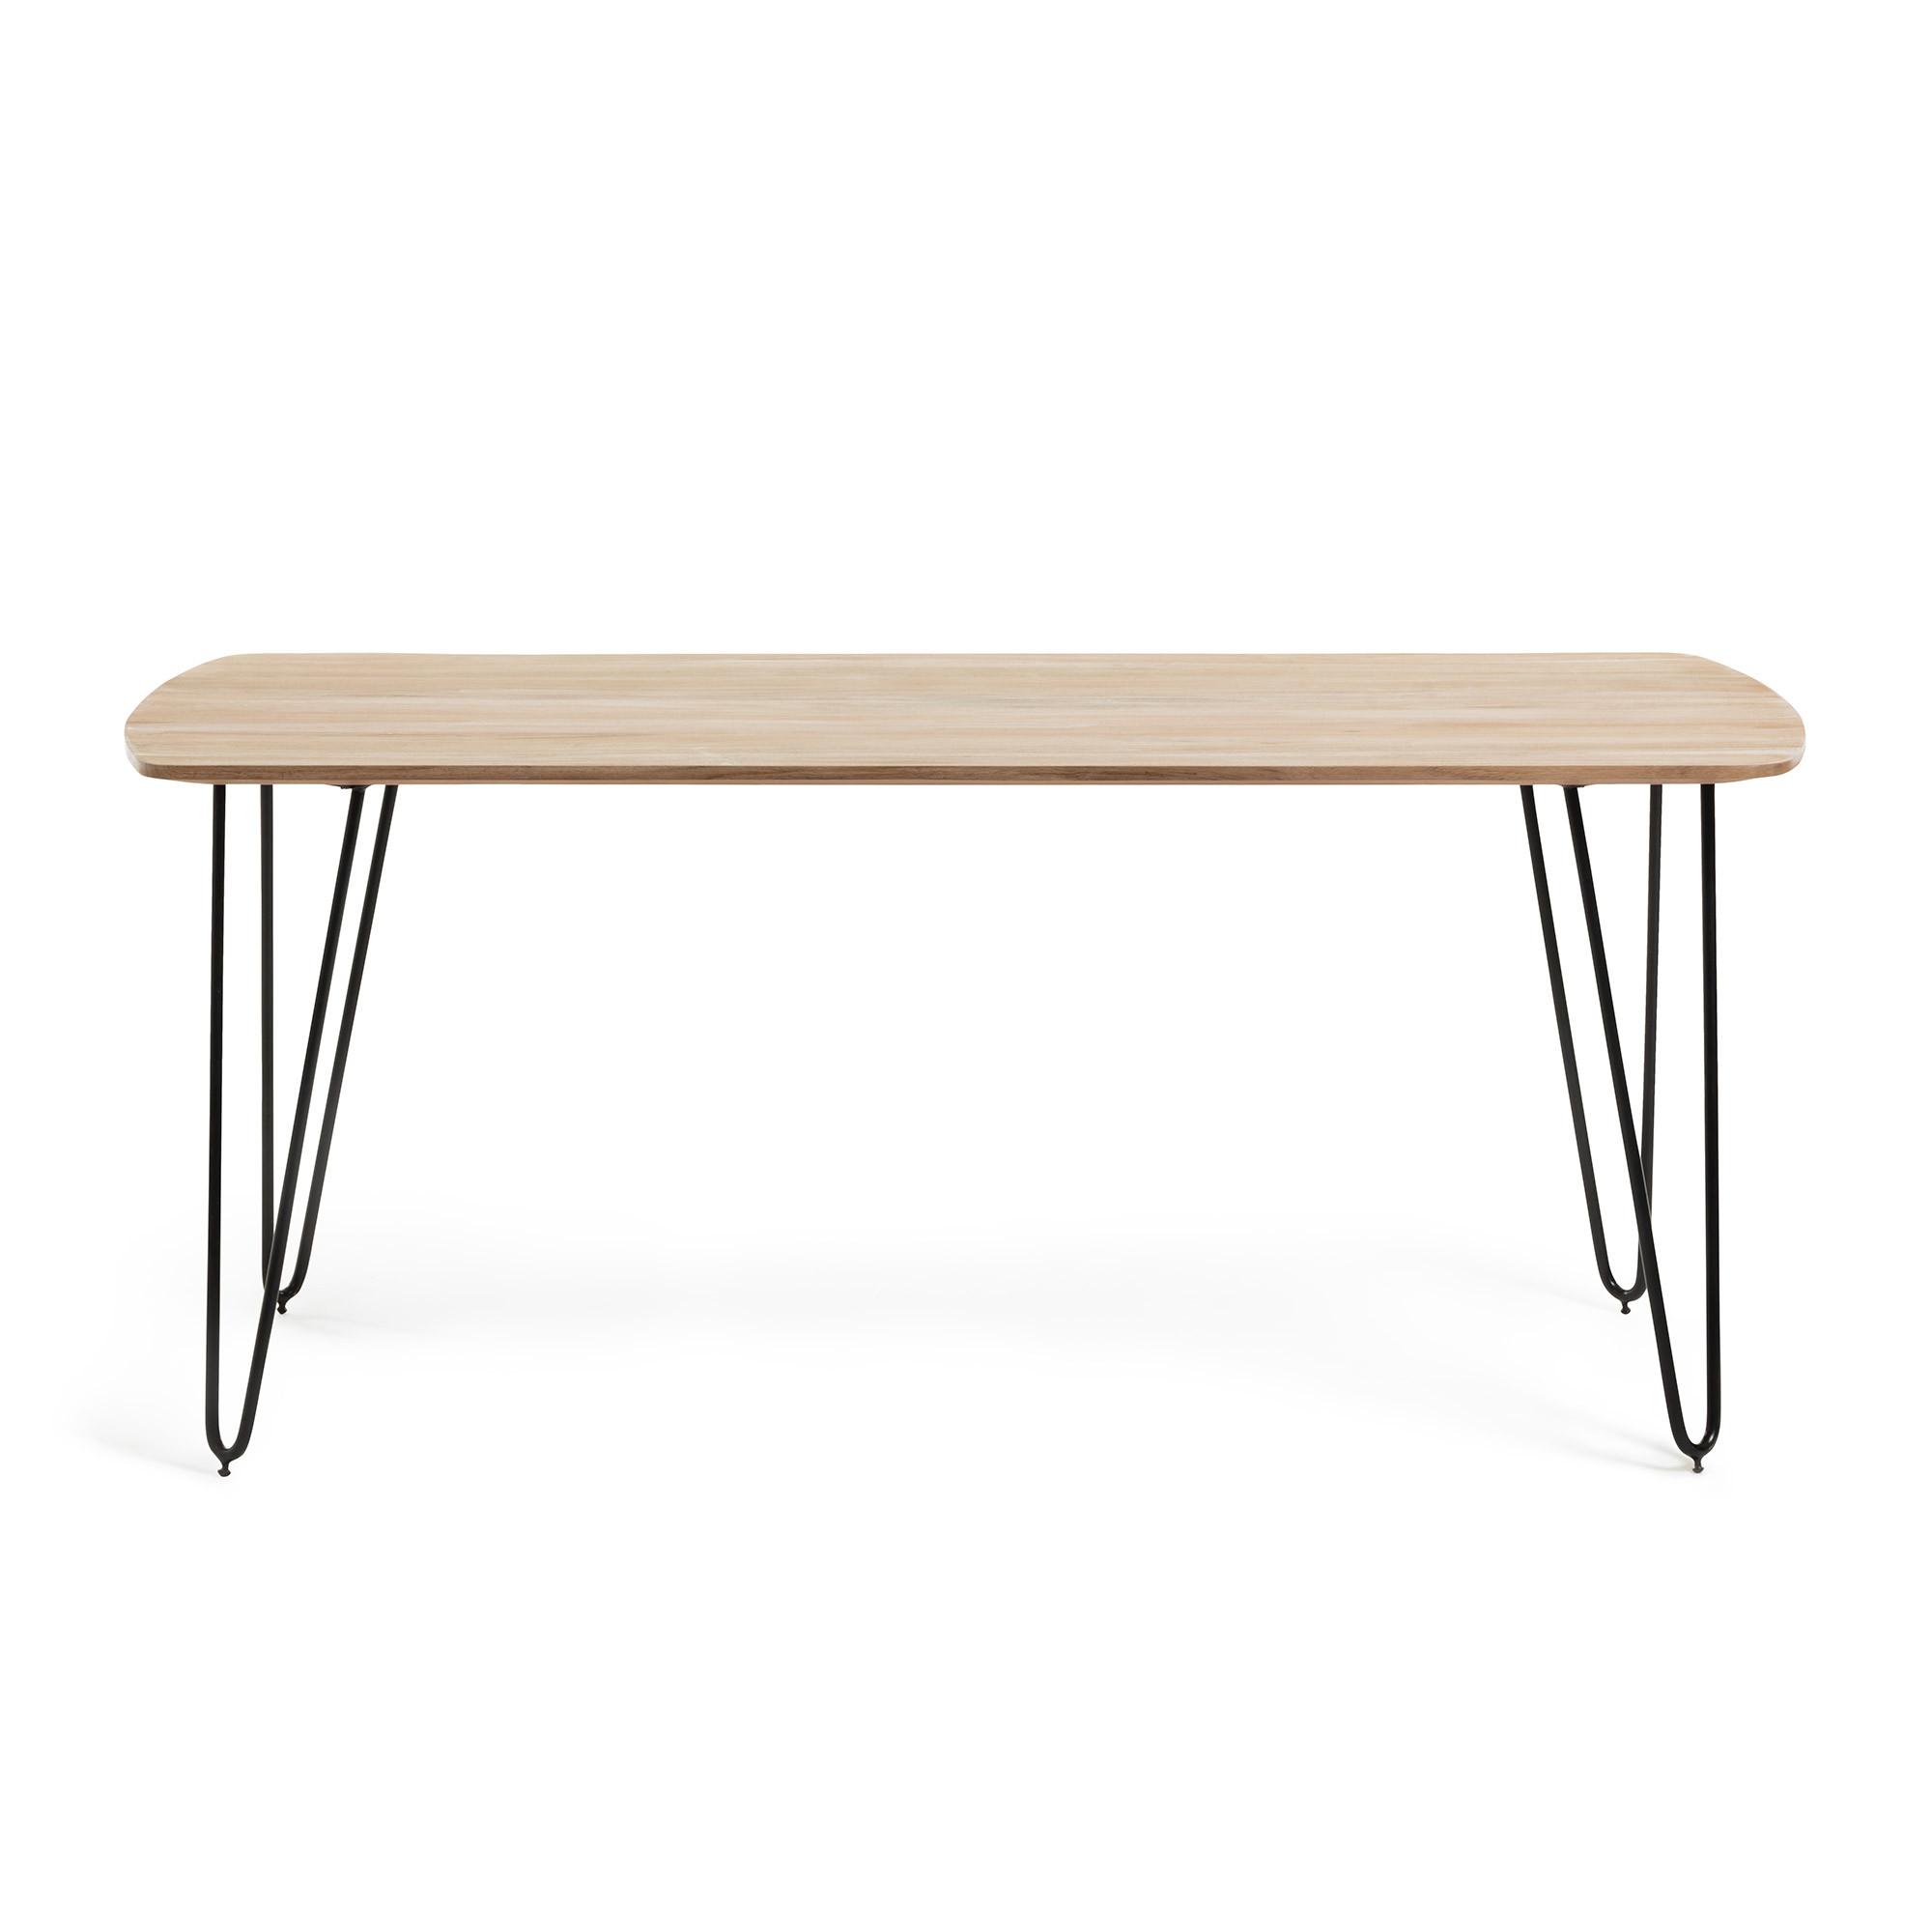 Tisch Barcli | Helles Holz